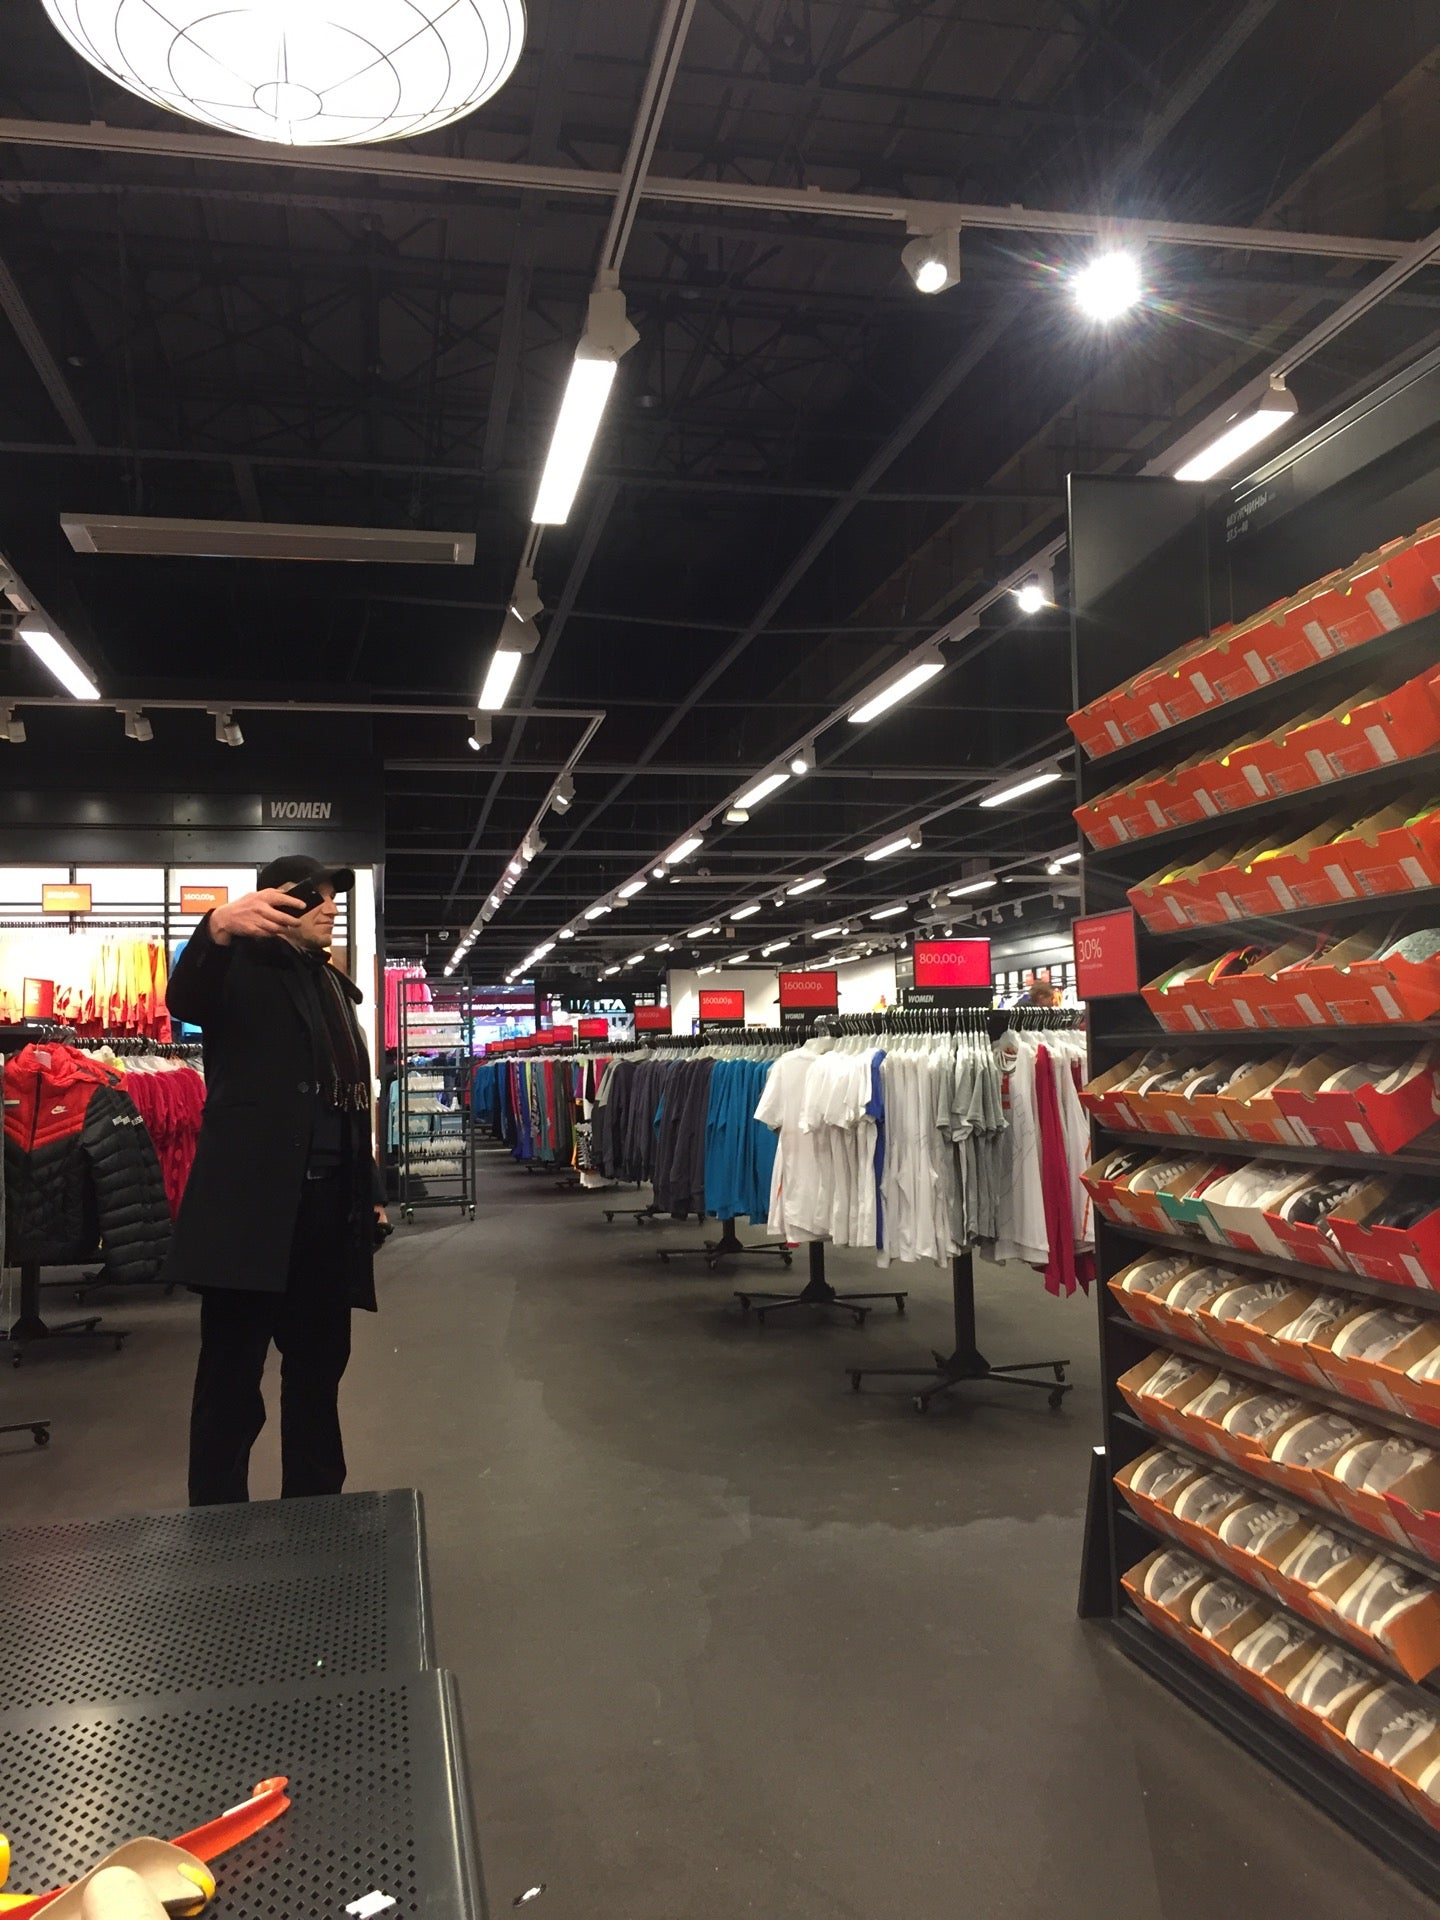 76b8e01e Nike Дисконт Центр на Орджоникидзе, отзывы о спортивных магазинах ...